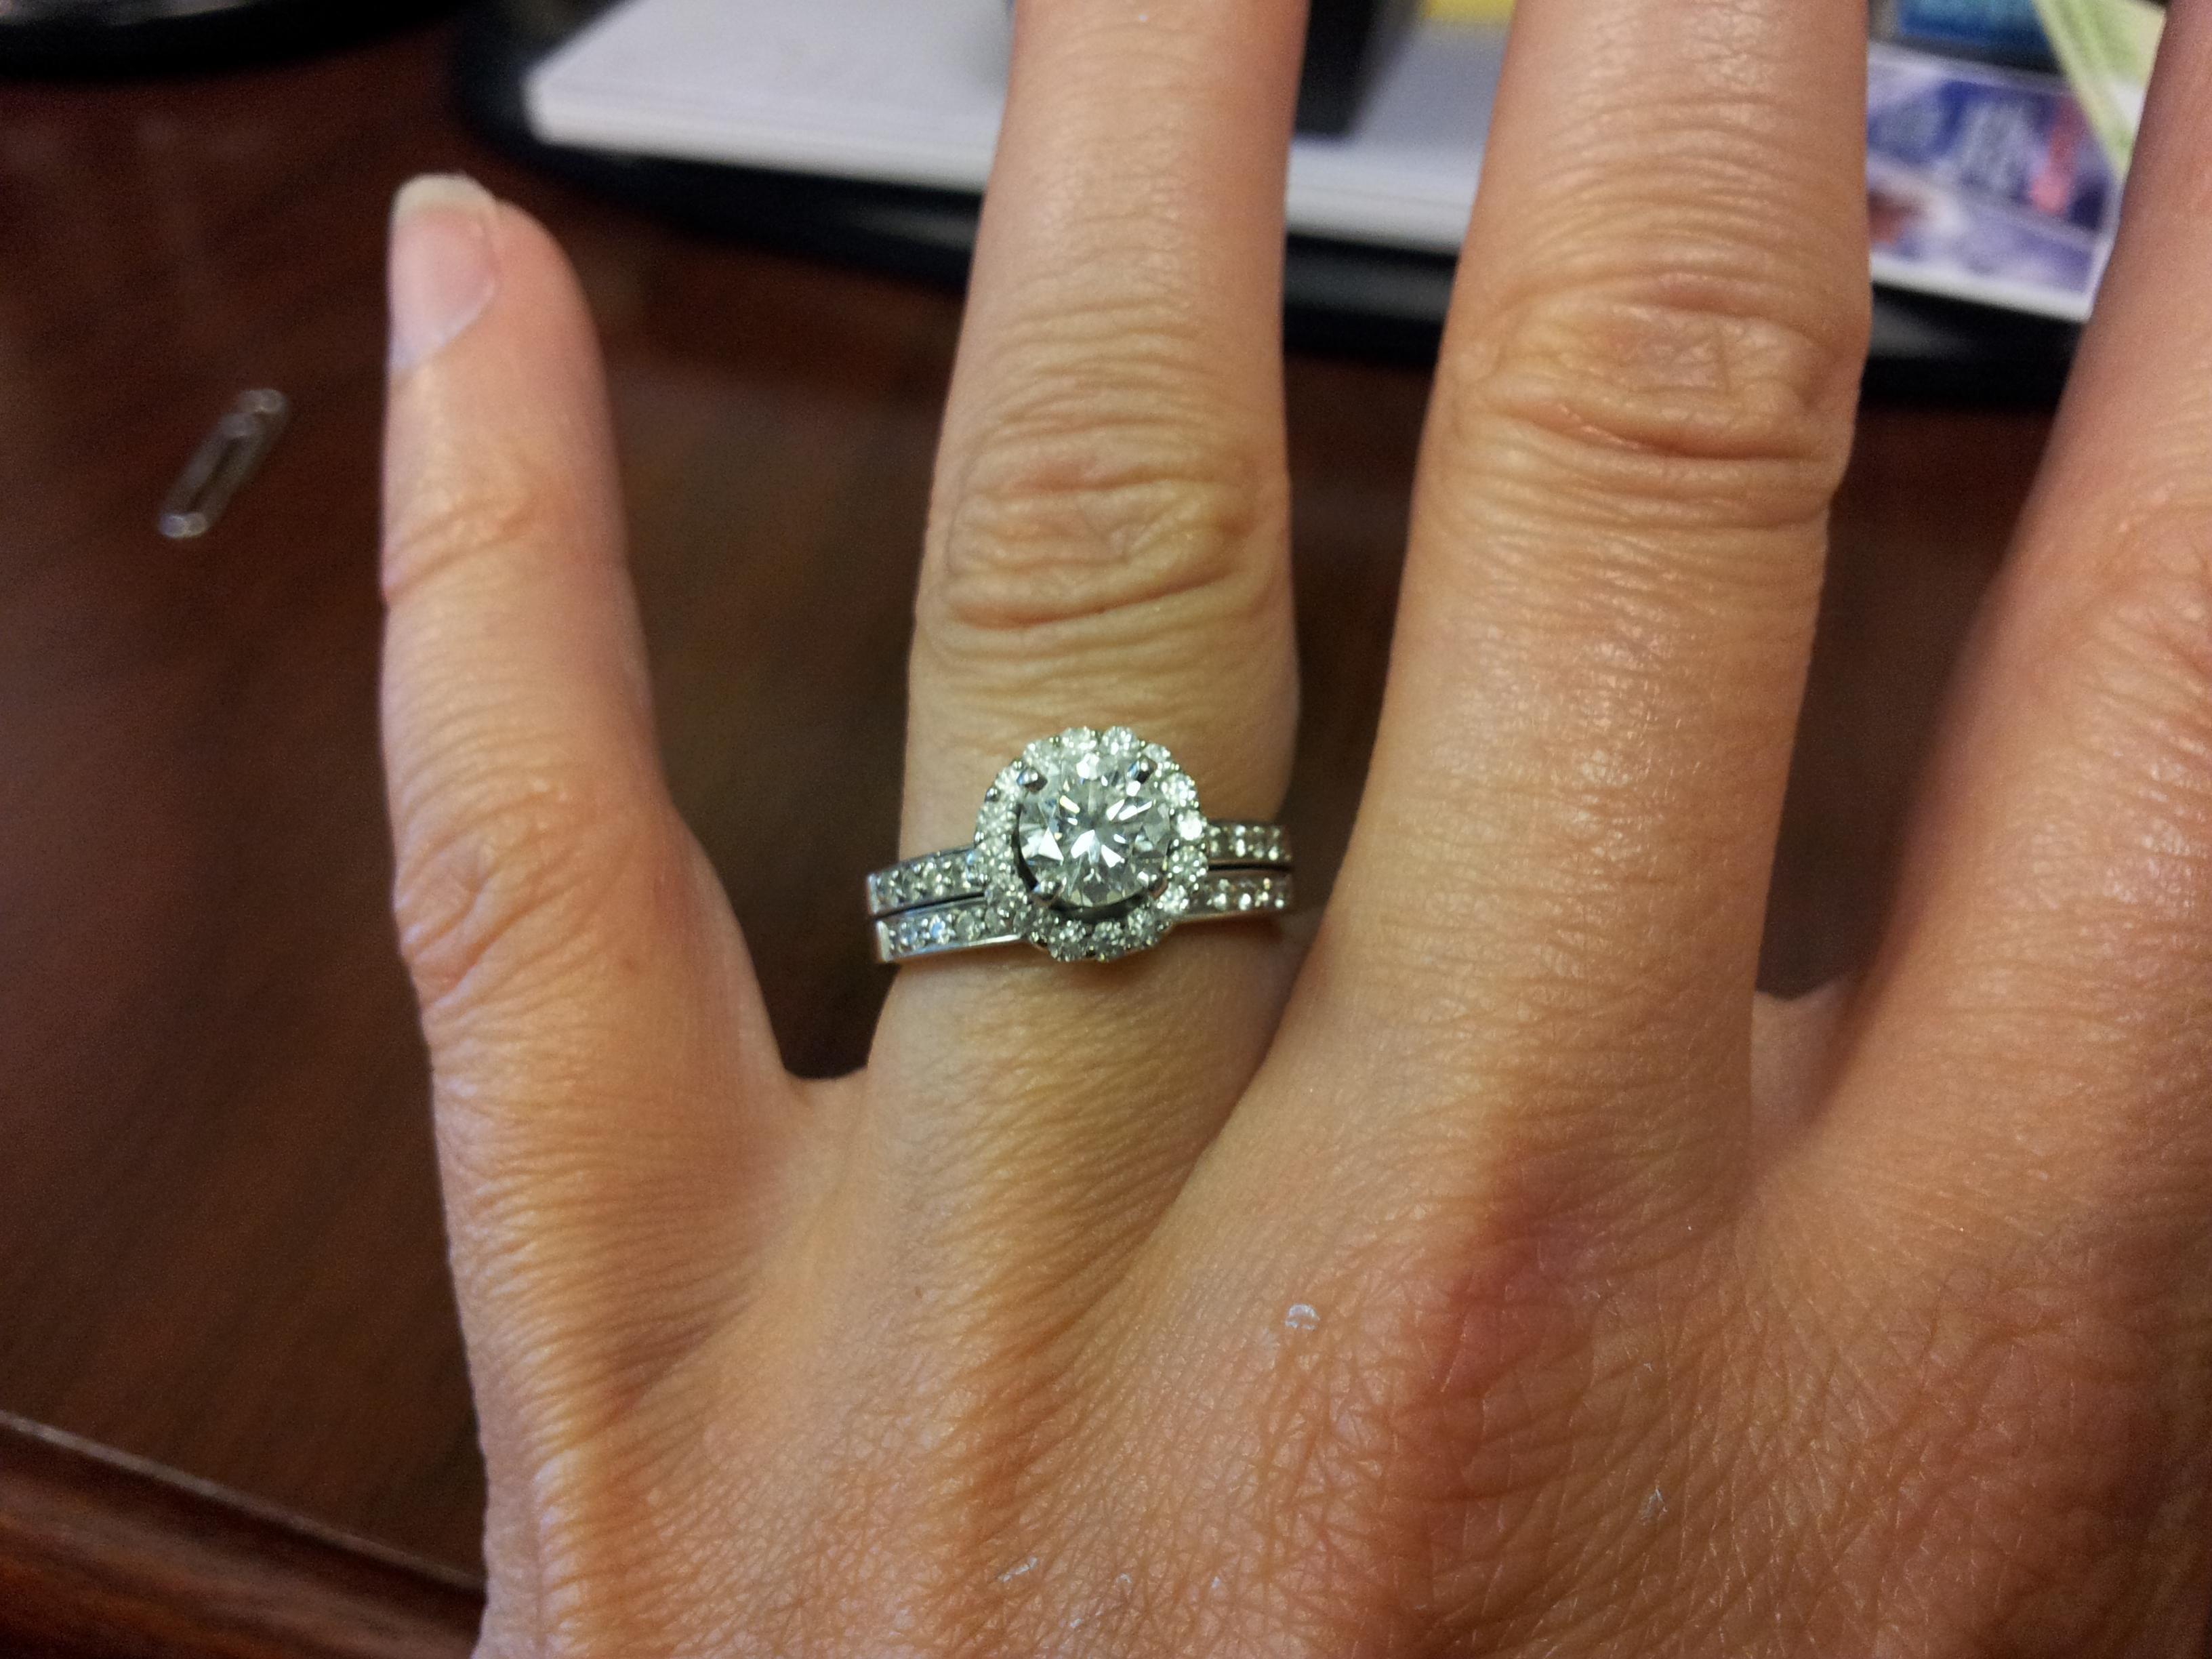 Jareds Engagement Rings H 1 Jared Engagement Rings Engagement Rings Engagement